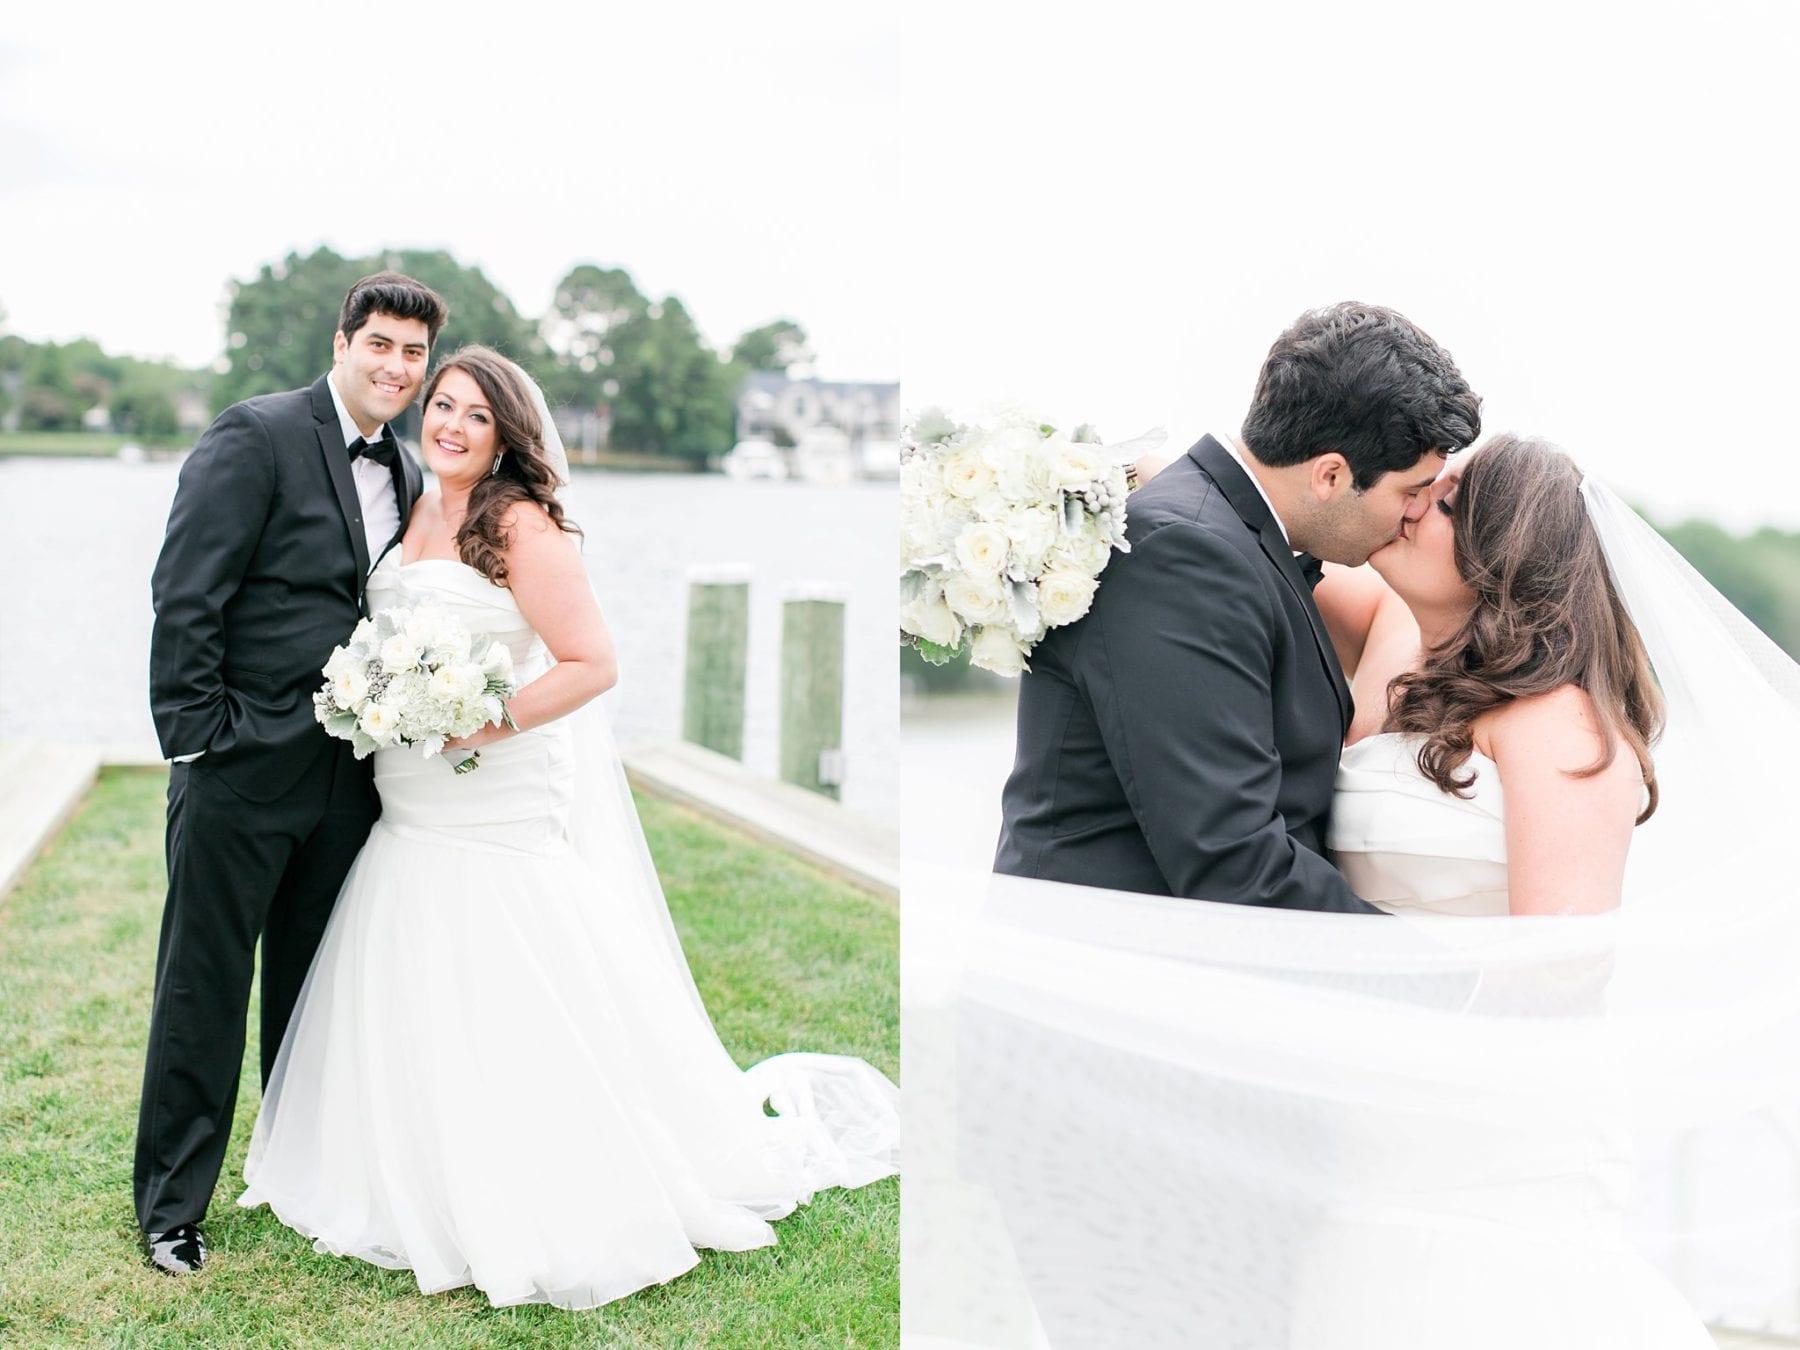 Chesapeake Bay Maritime Museum Wedding Photos Maryland Wedding Photographer Megan Kelsey Photography Halie & Mike-54.jpg